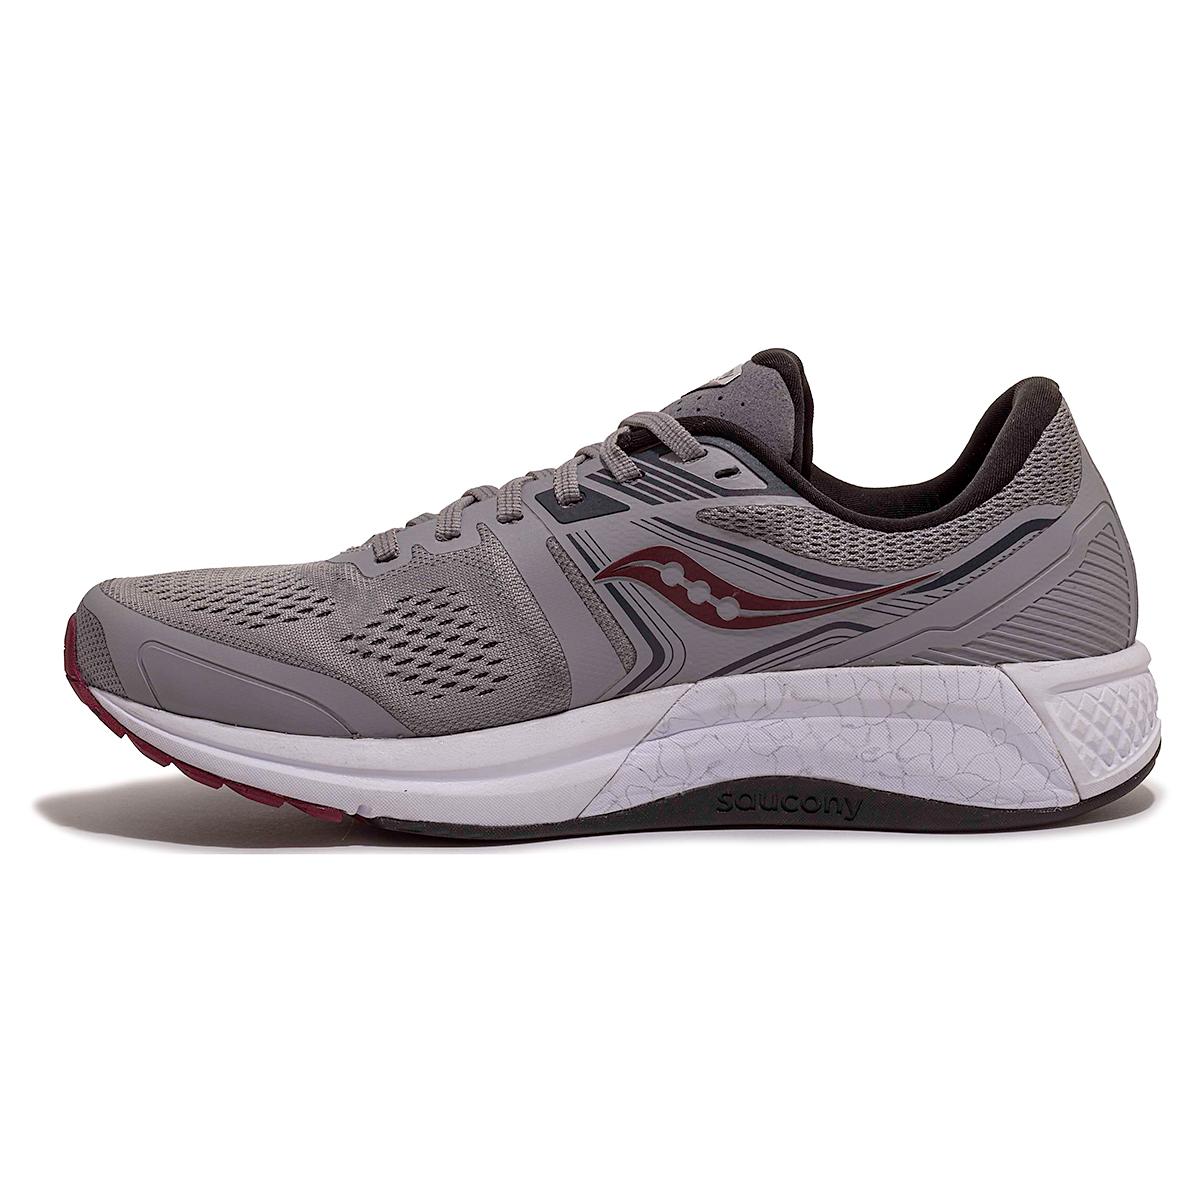 Men's Saucony Omni 19 Running Shoe, , large, image 5